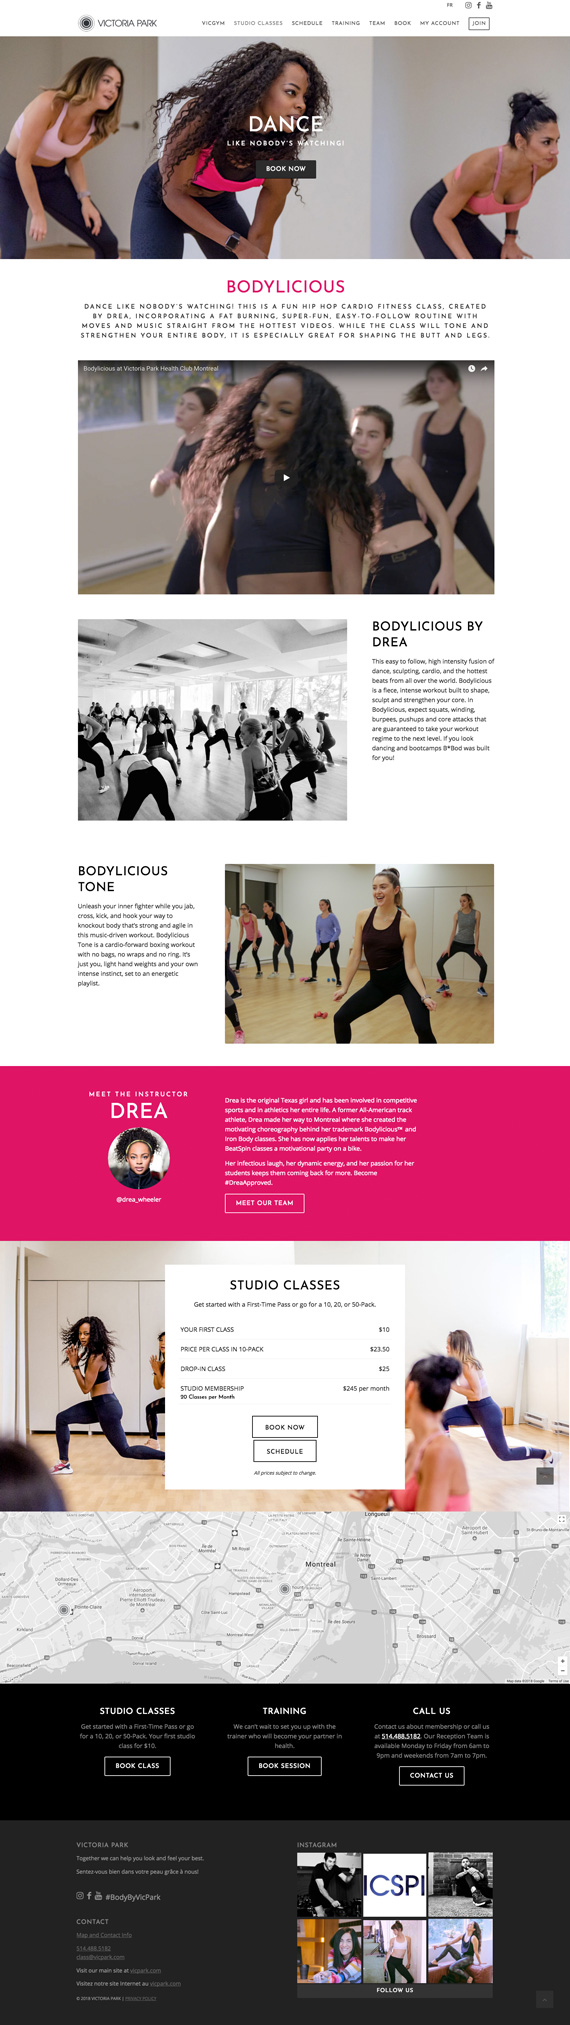 Fitness Website Design: Victoria Park Fitness